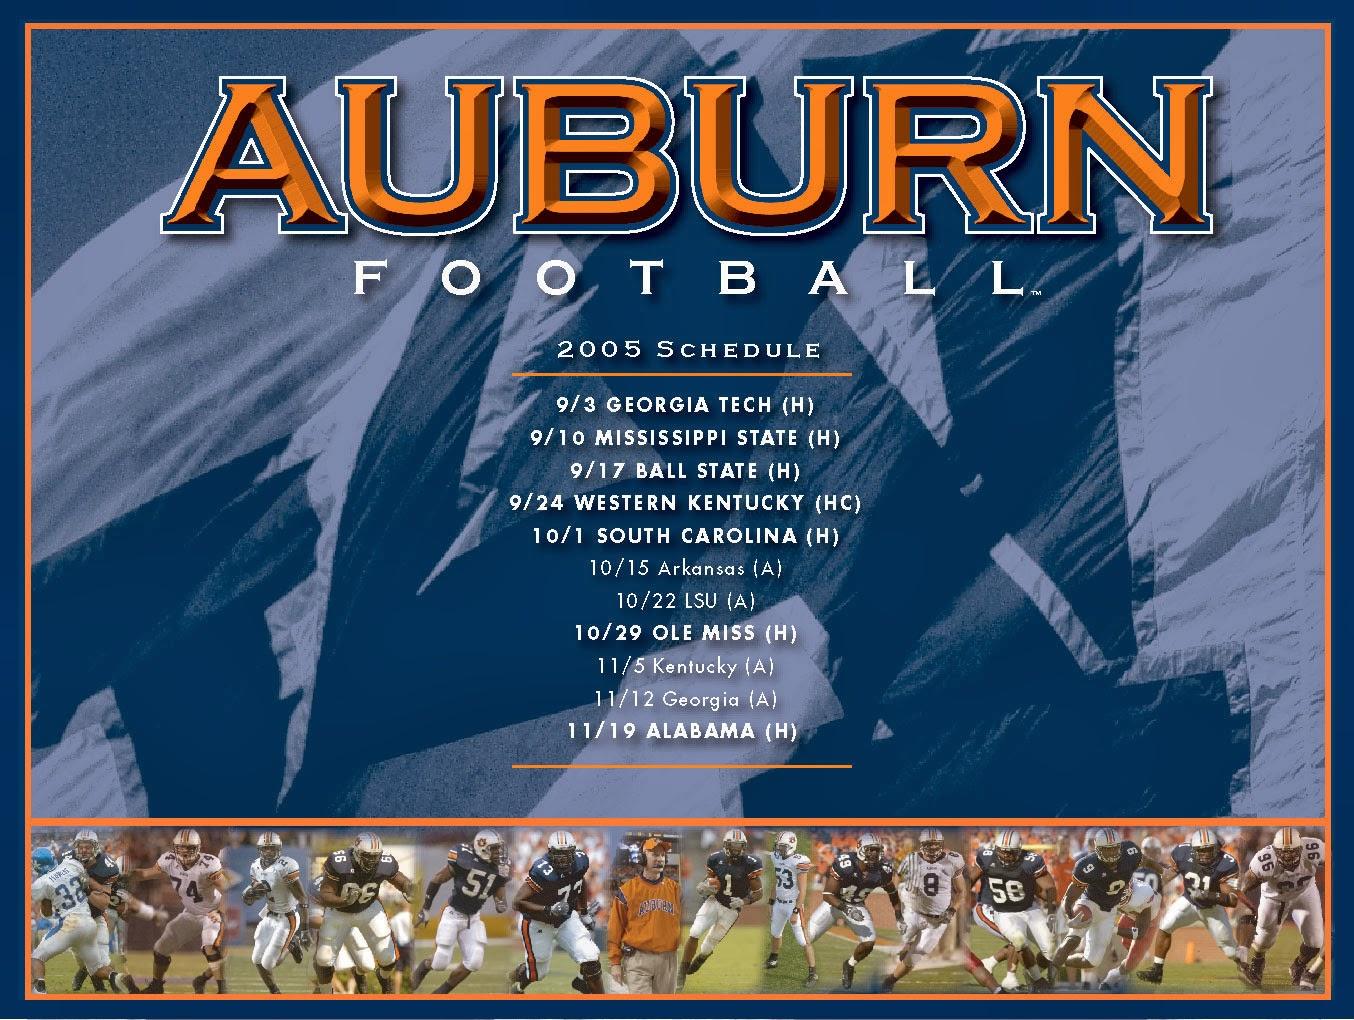 Auburn football wallpaper and make this Auburn football wallpaper for 1354x1020